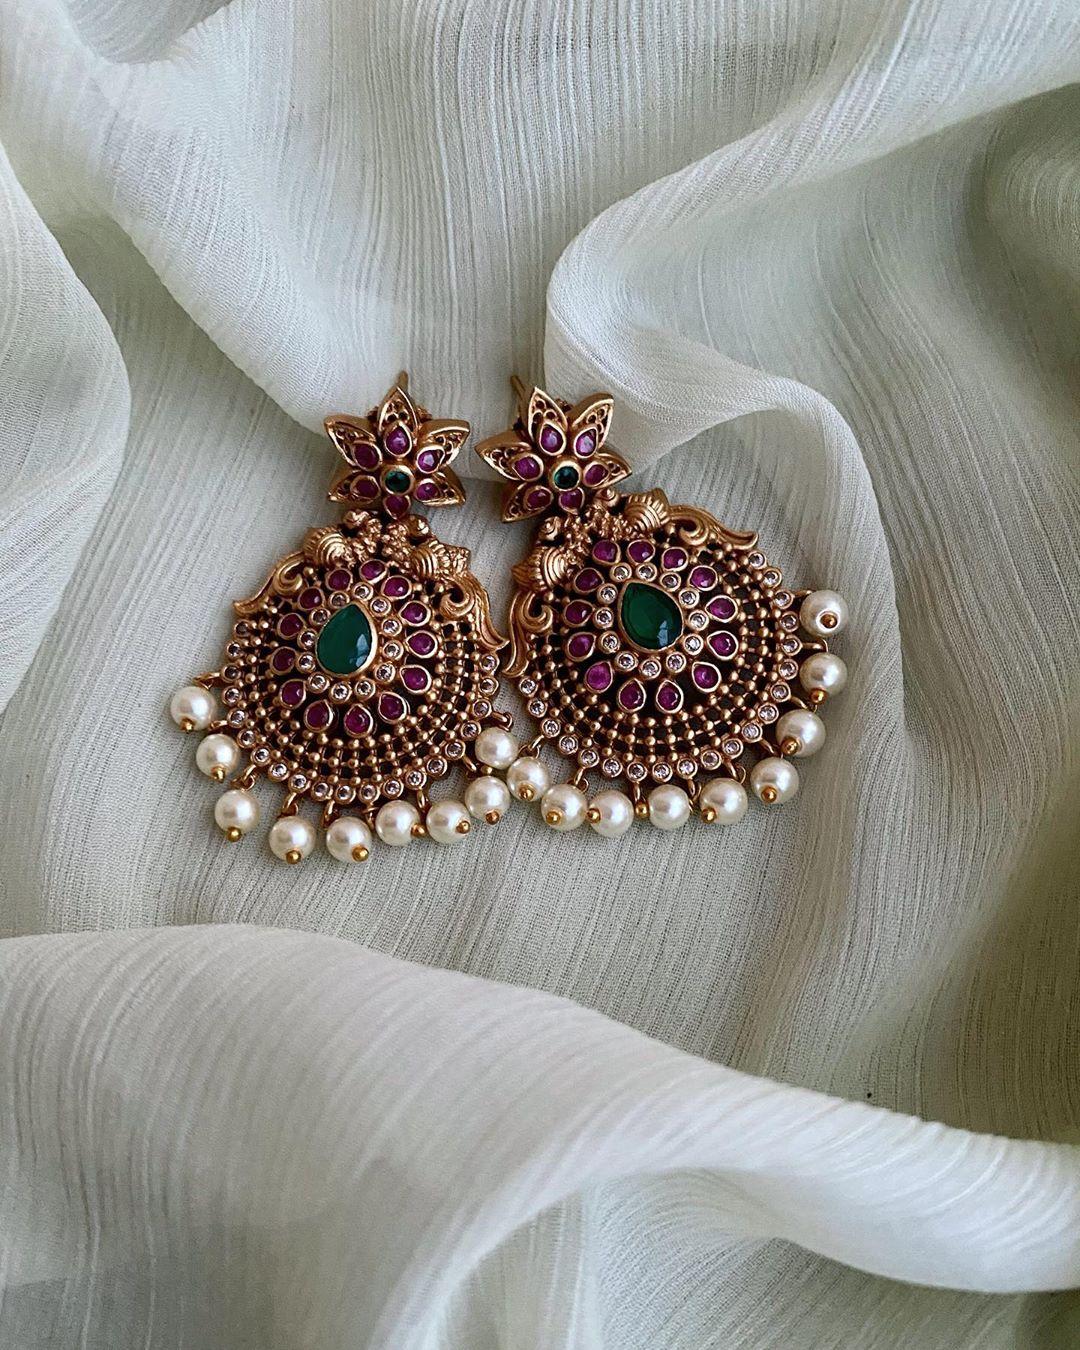 floral-design-kemp-pearl-earrings